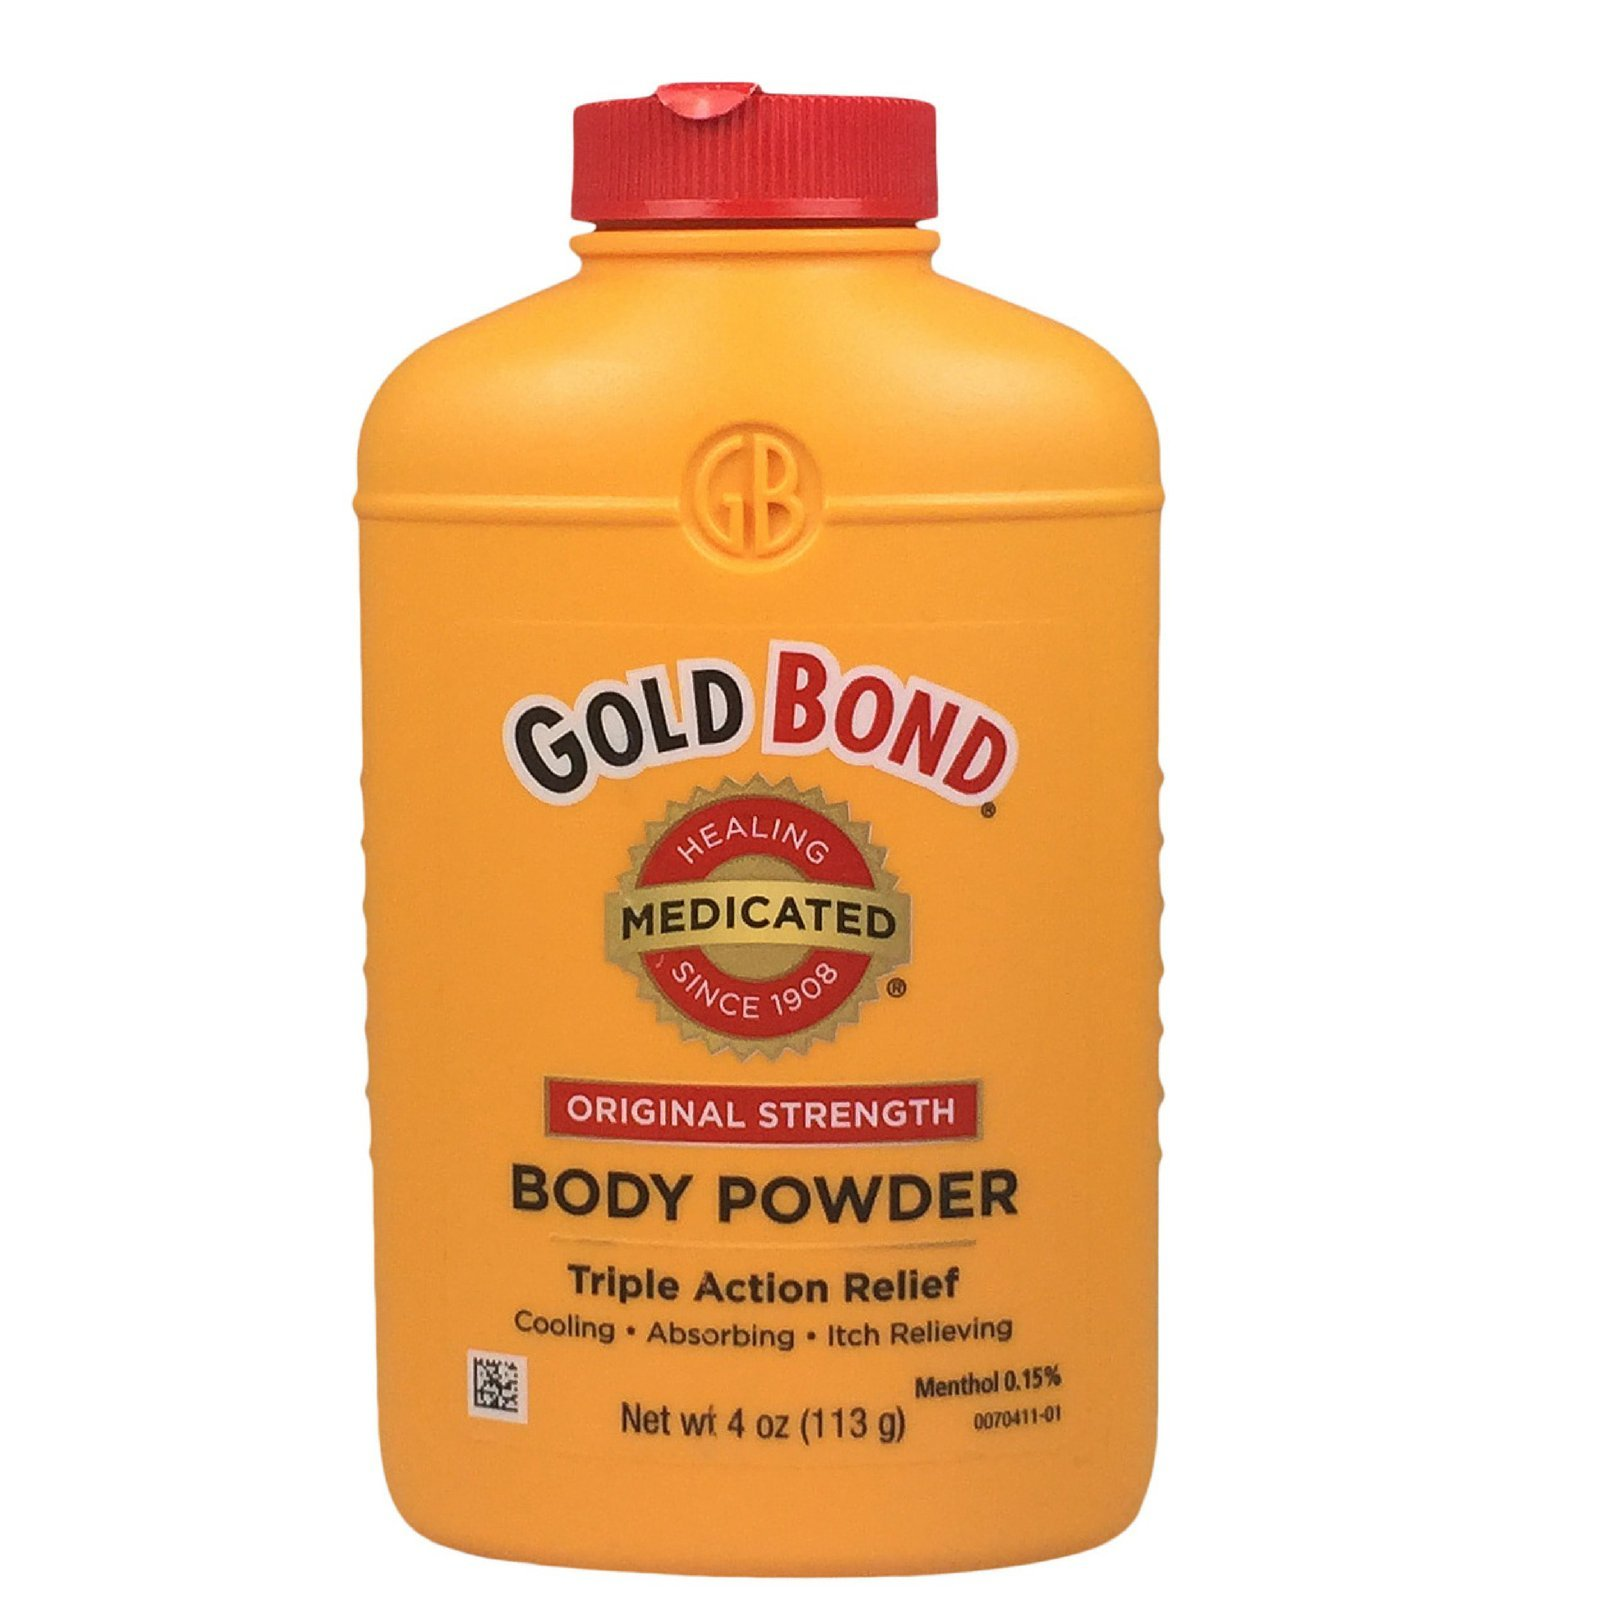 Gold Bond Medicated Body Powder, 4 oz (113 g) (Pack of 4)